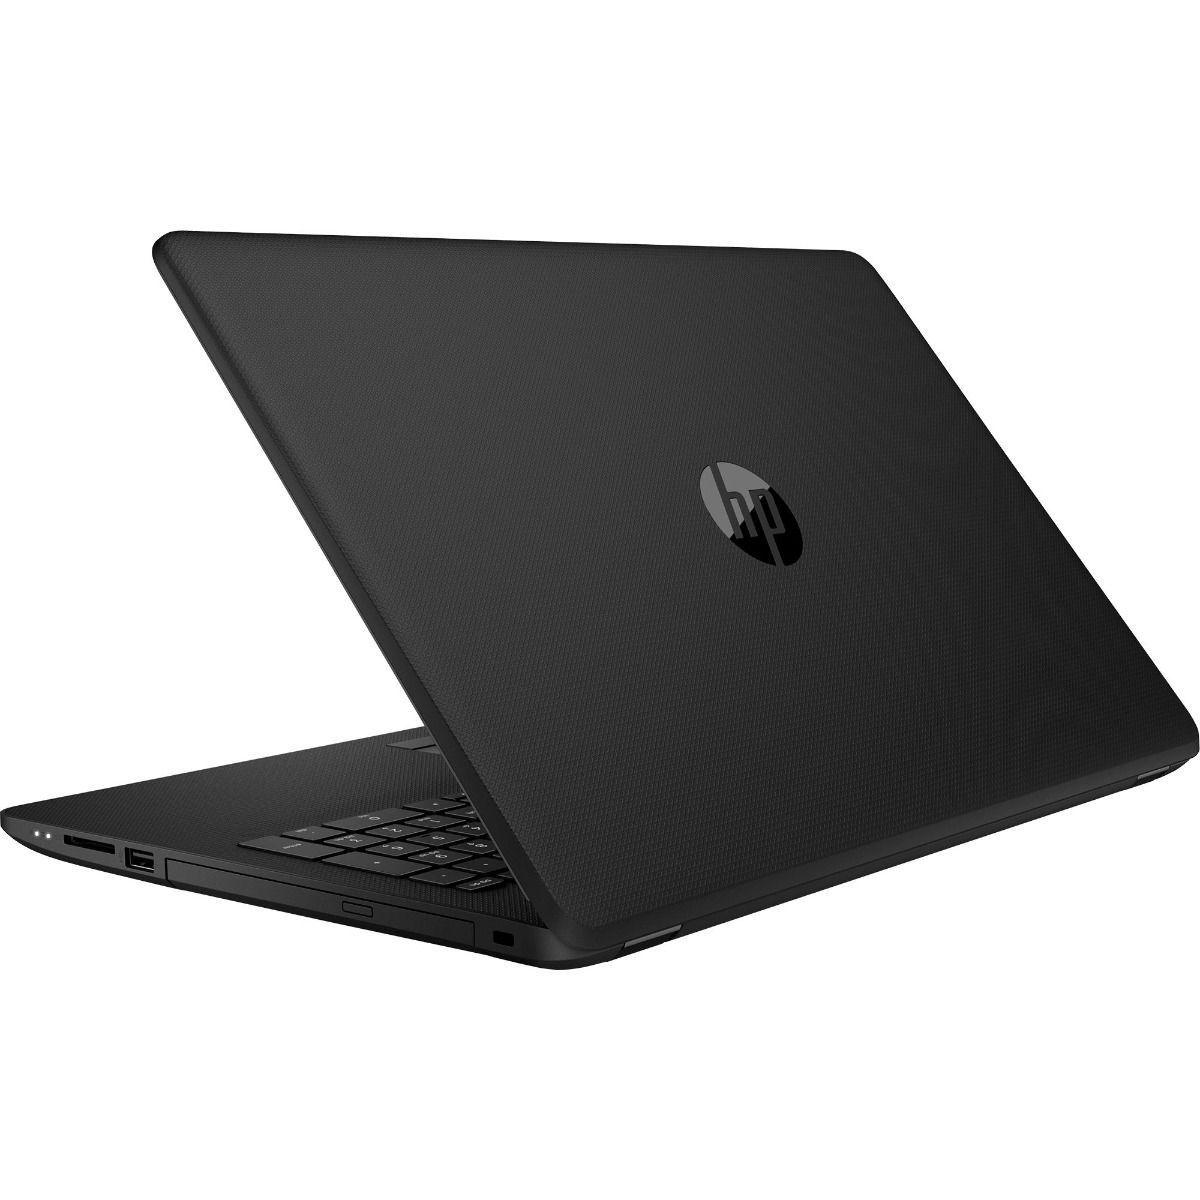 Robots Laptop Laptop Hp Pegatinas Laptop Laptop Wallpaper Desktop Wallpapers Laptop De Carton Laptop Ill In 2020 Hp Laptop Stickers Hp Laptop Case Laptop Skin Hp